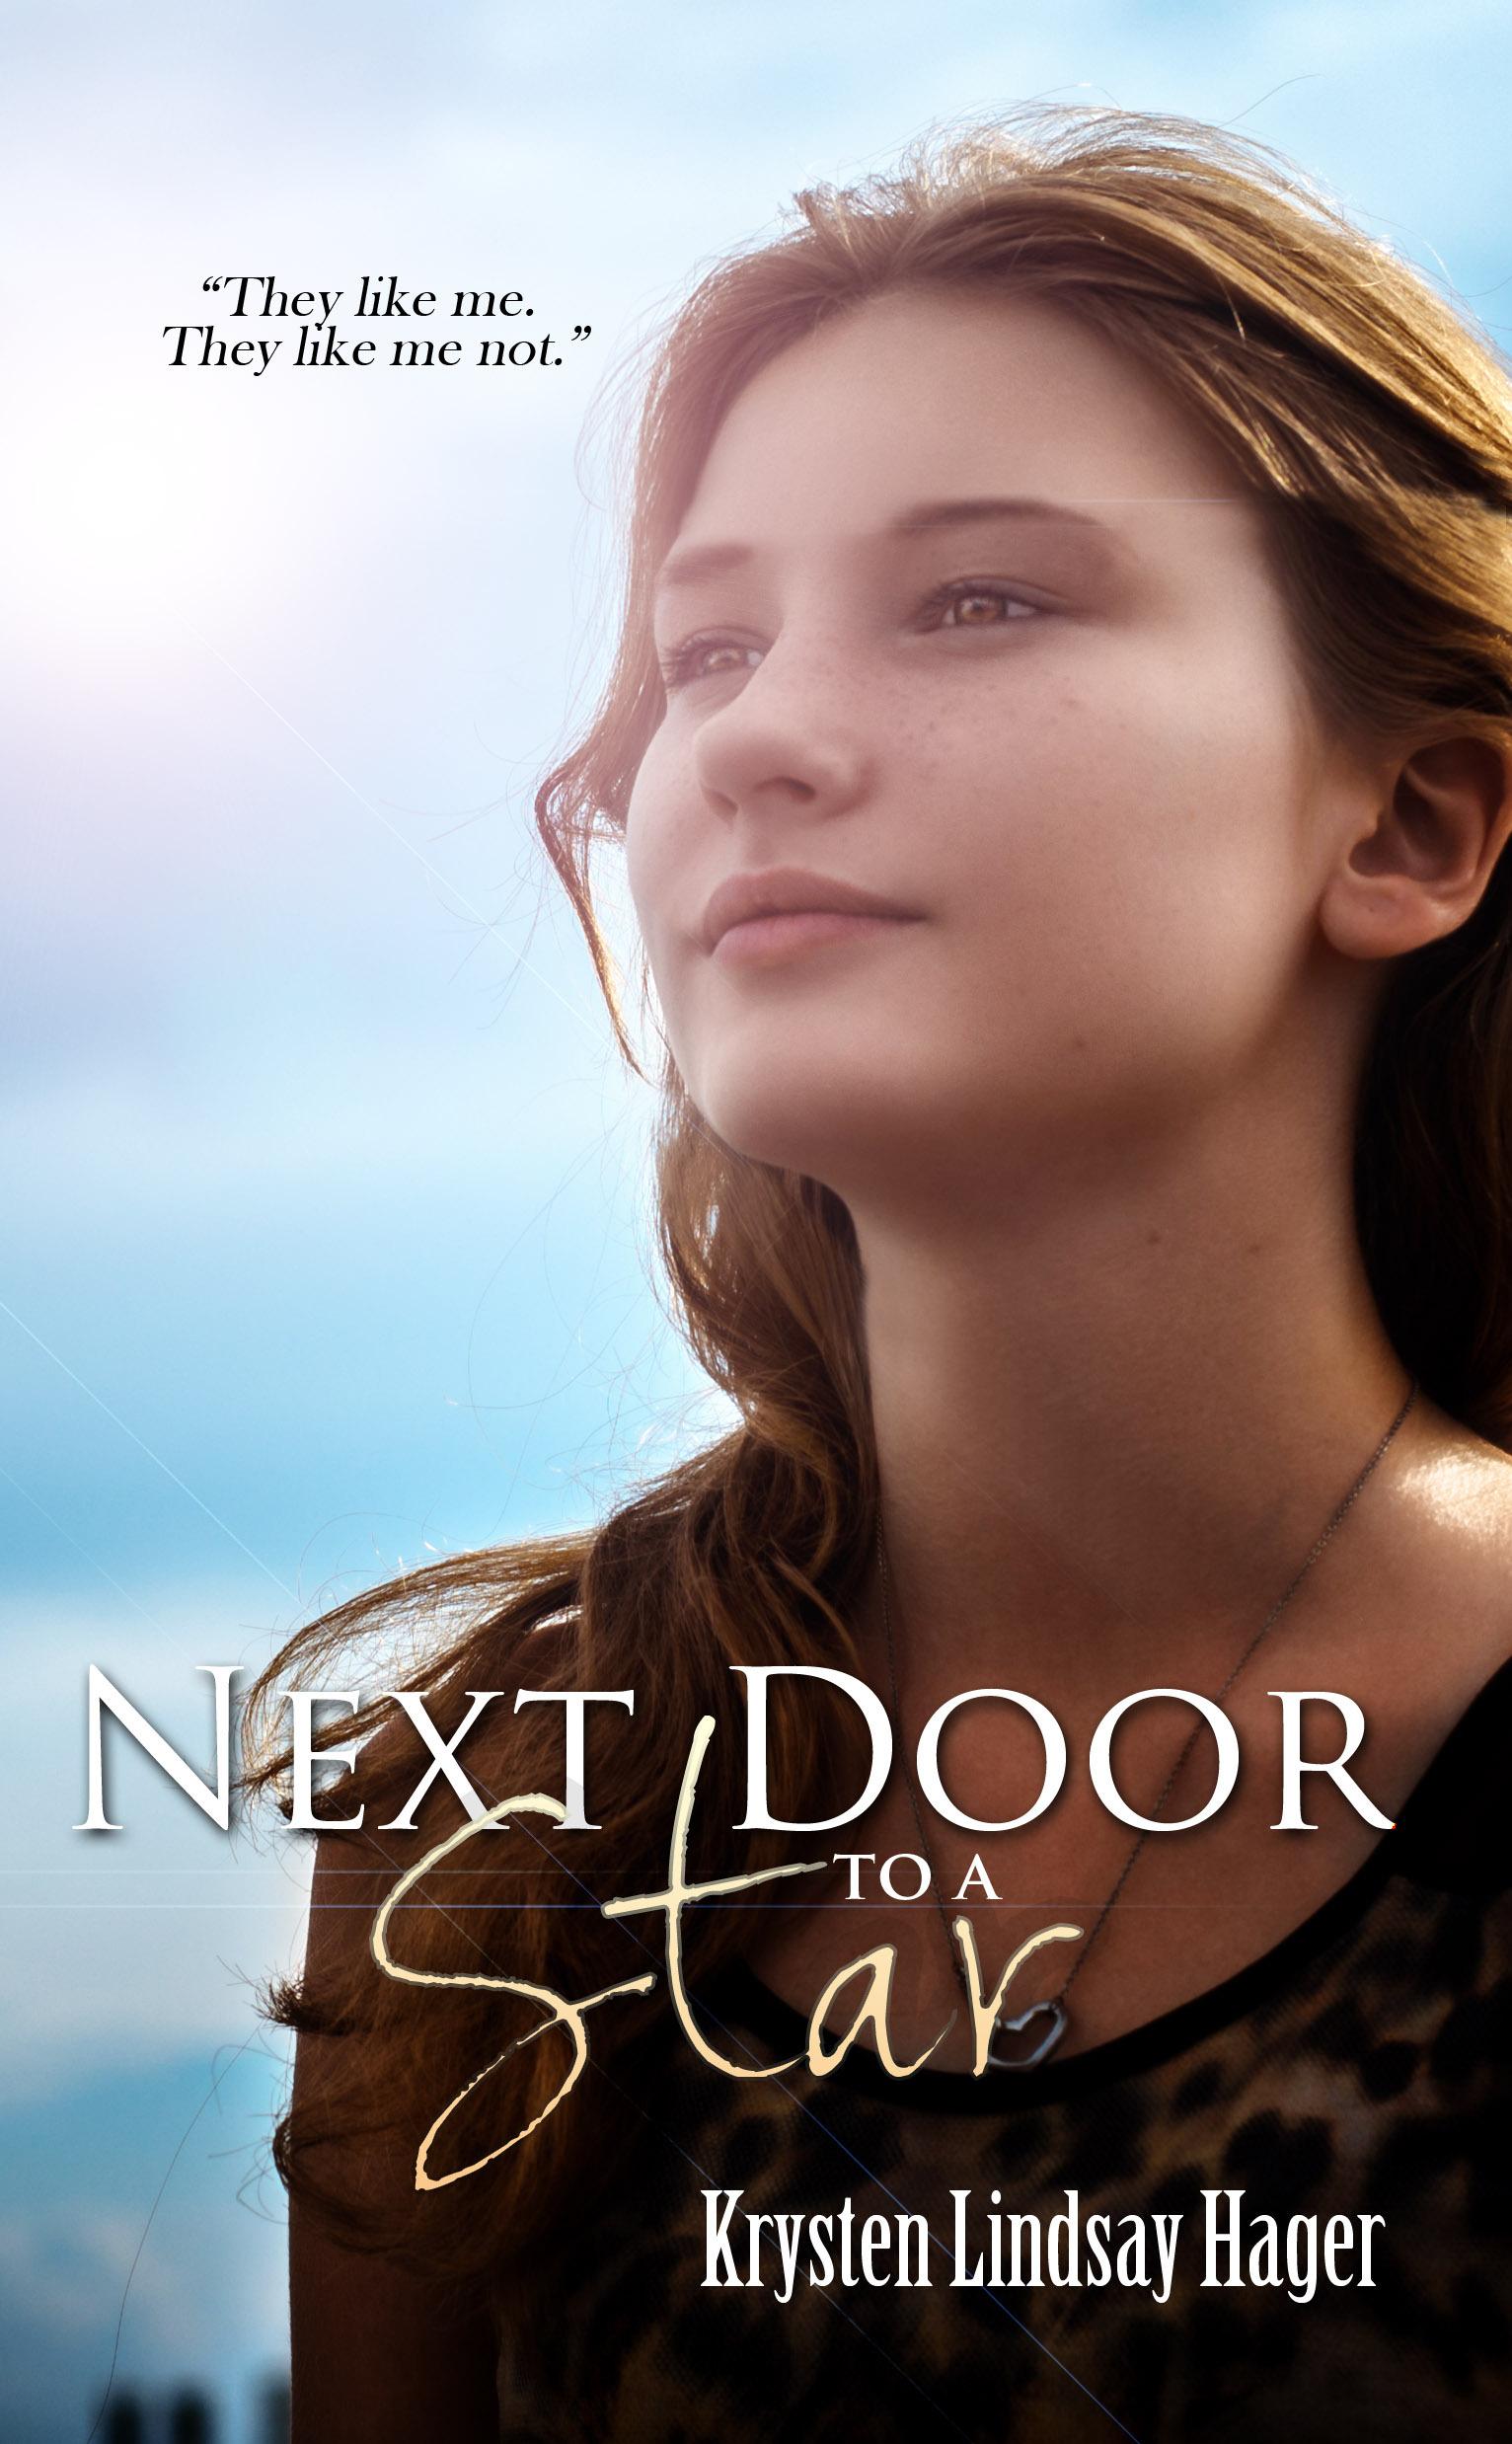 Next Door to a Star  by  Krysten Lindsay Hager